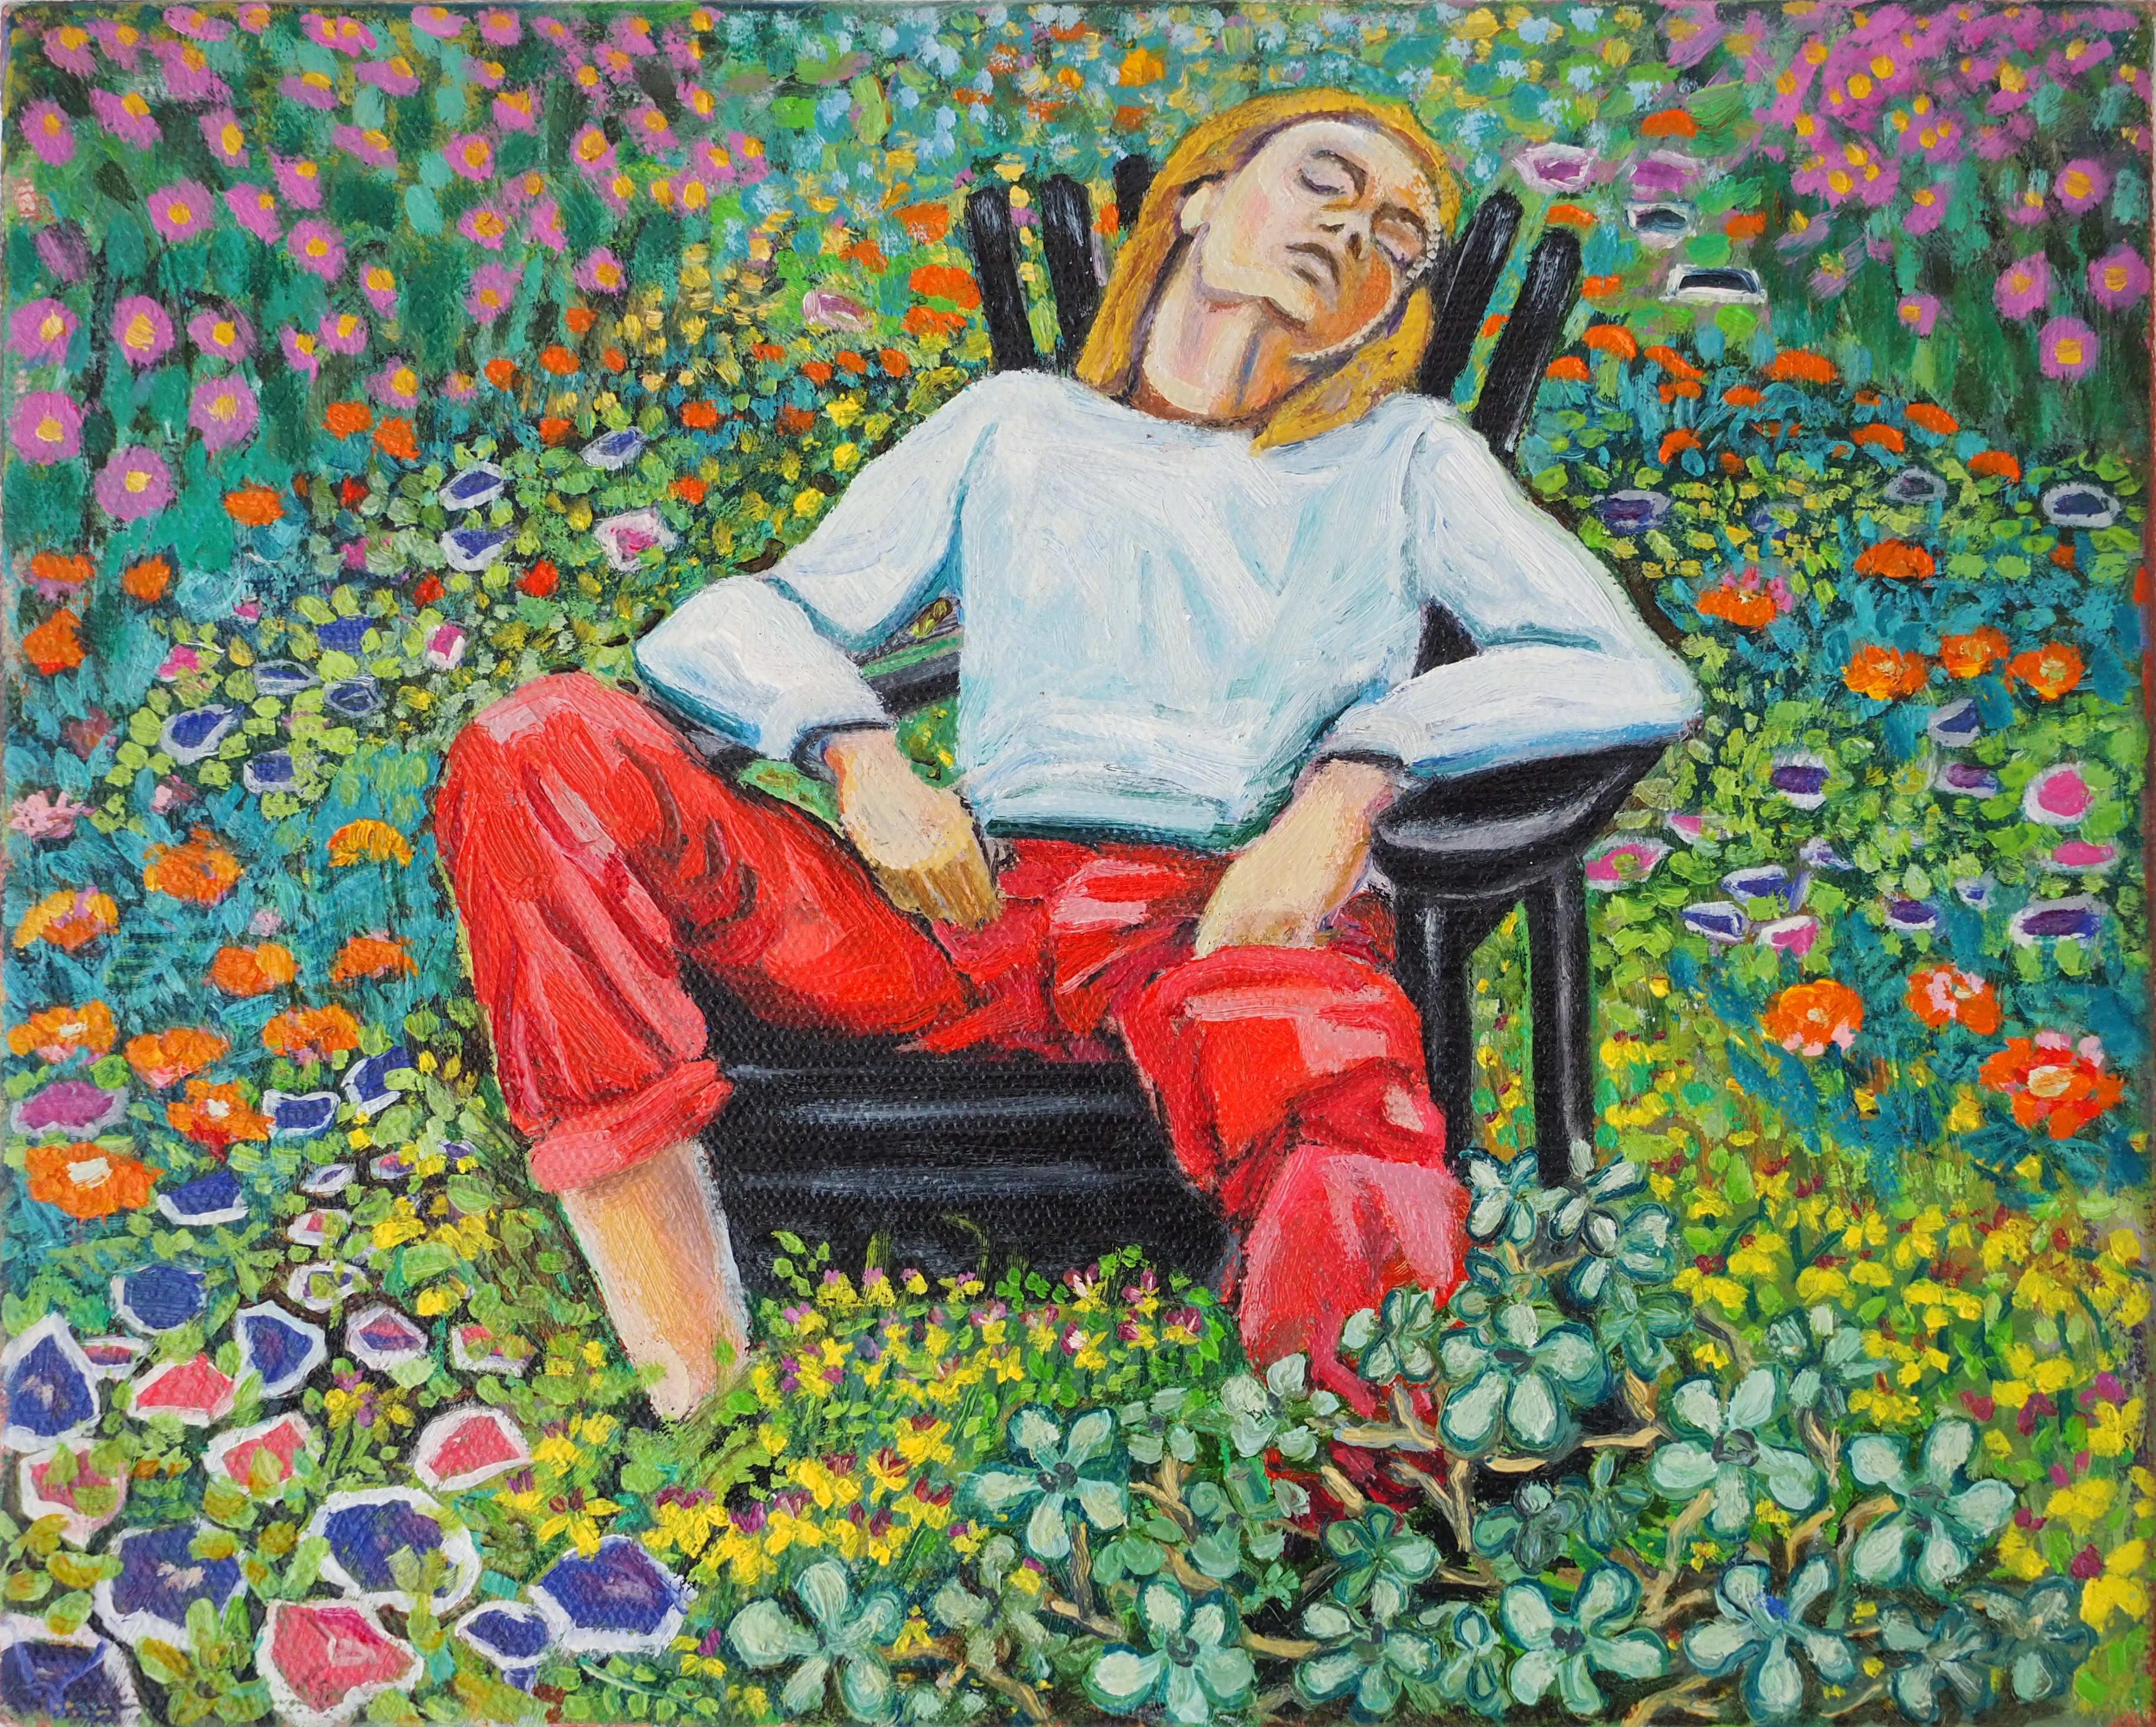 Sleeping Beauty 20x25cm oil on canvas NFS SOLD